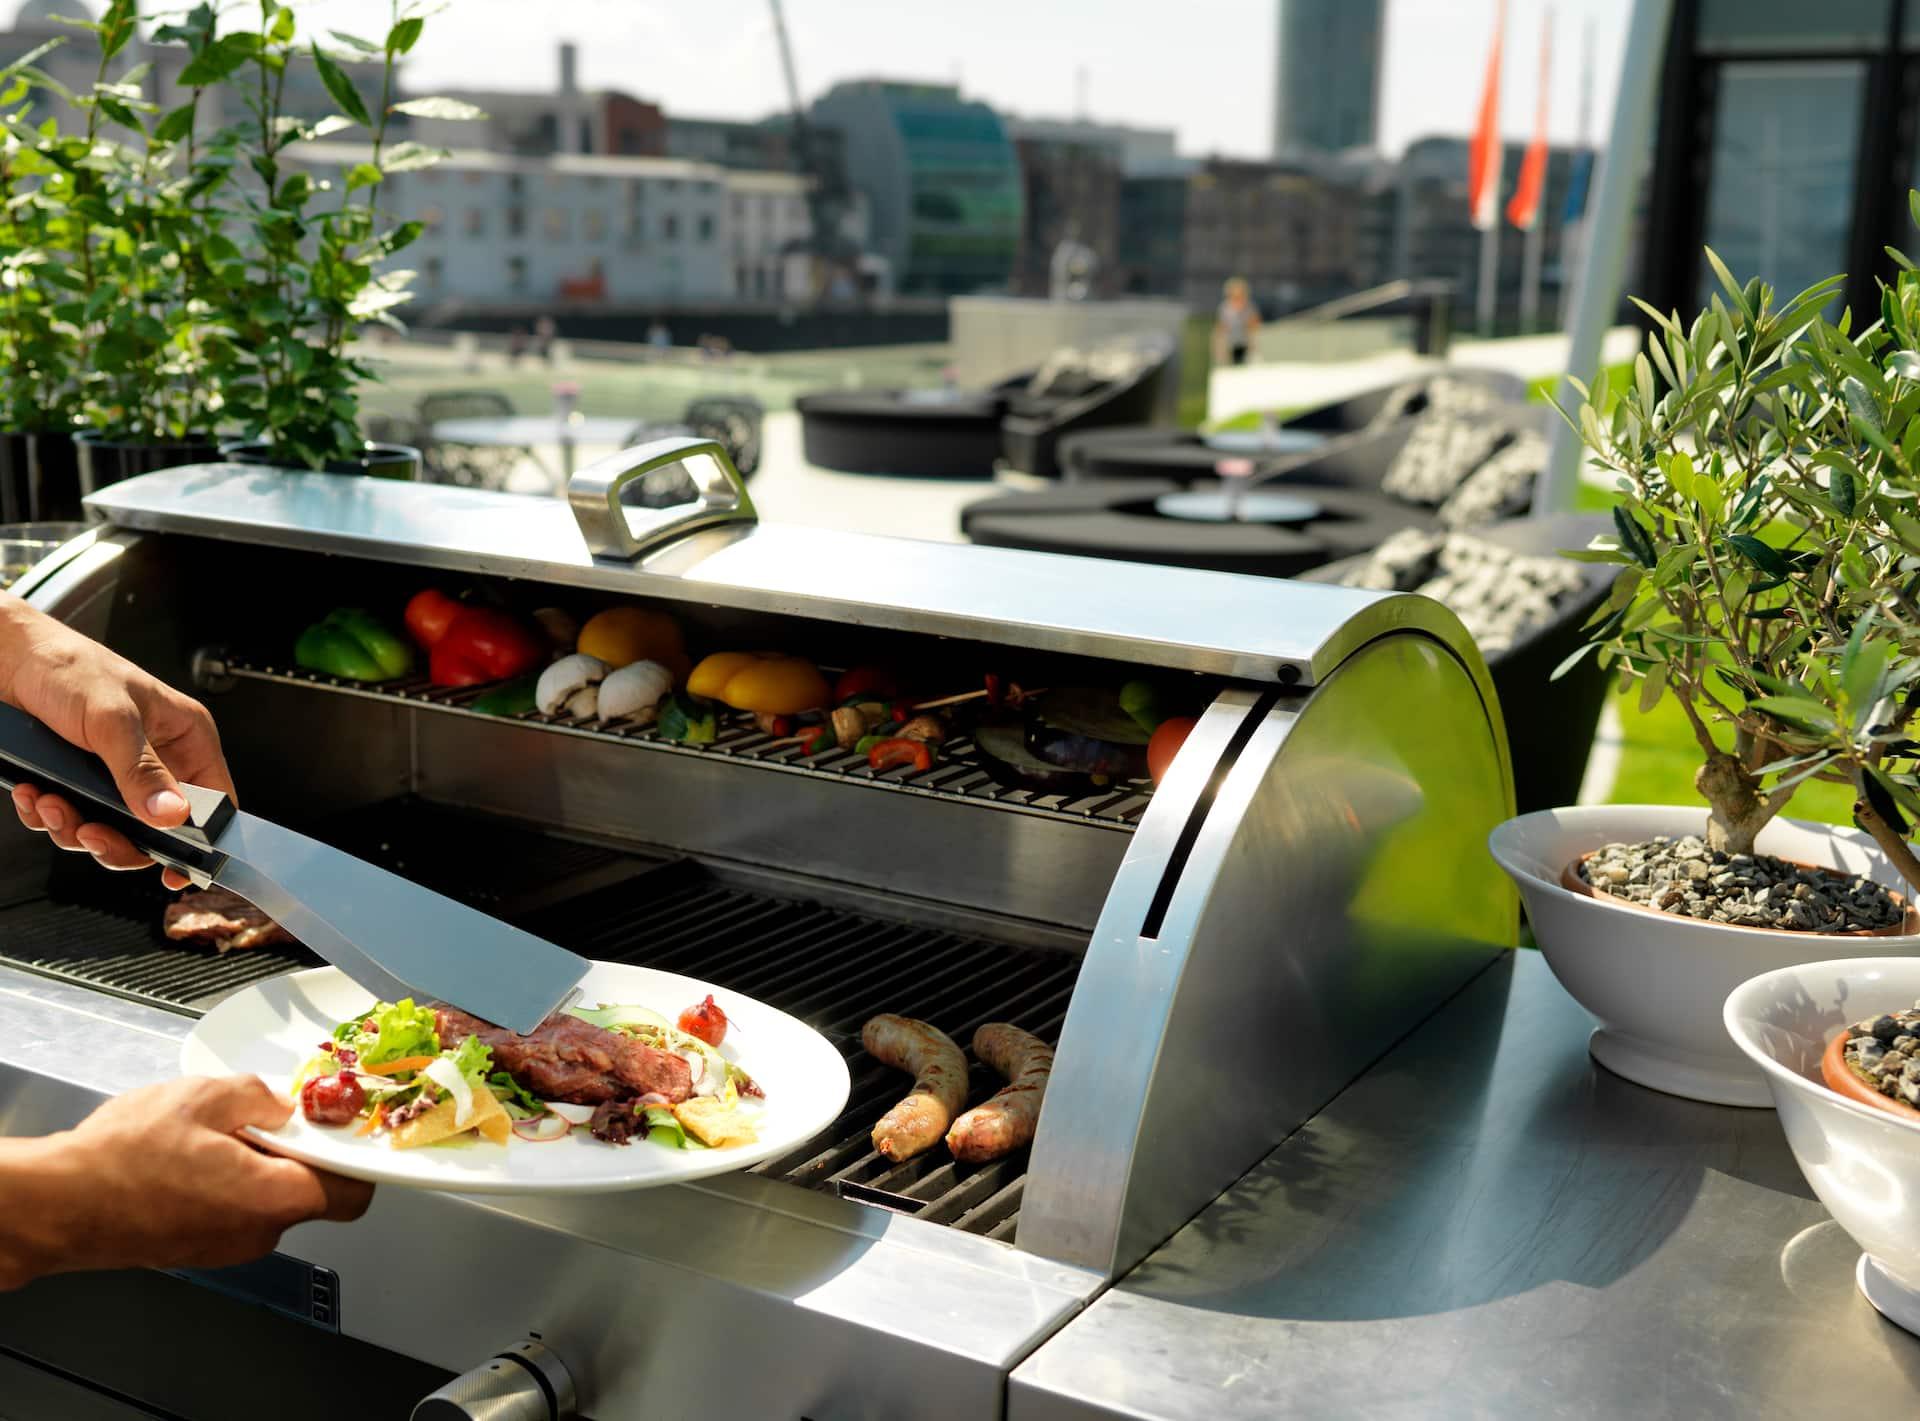 Live BBQ & cooking stations at Hyatt Regency Dusseldorf